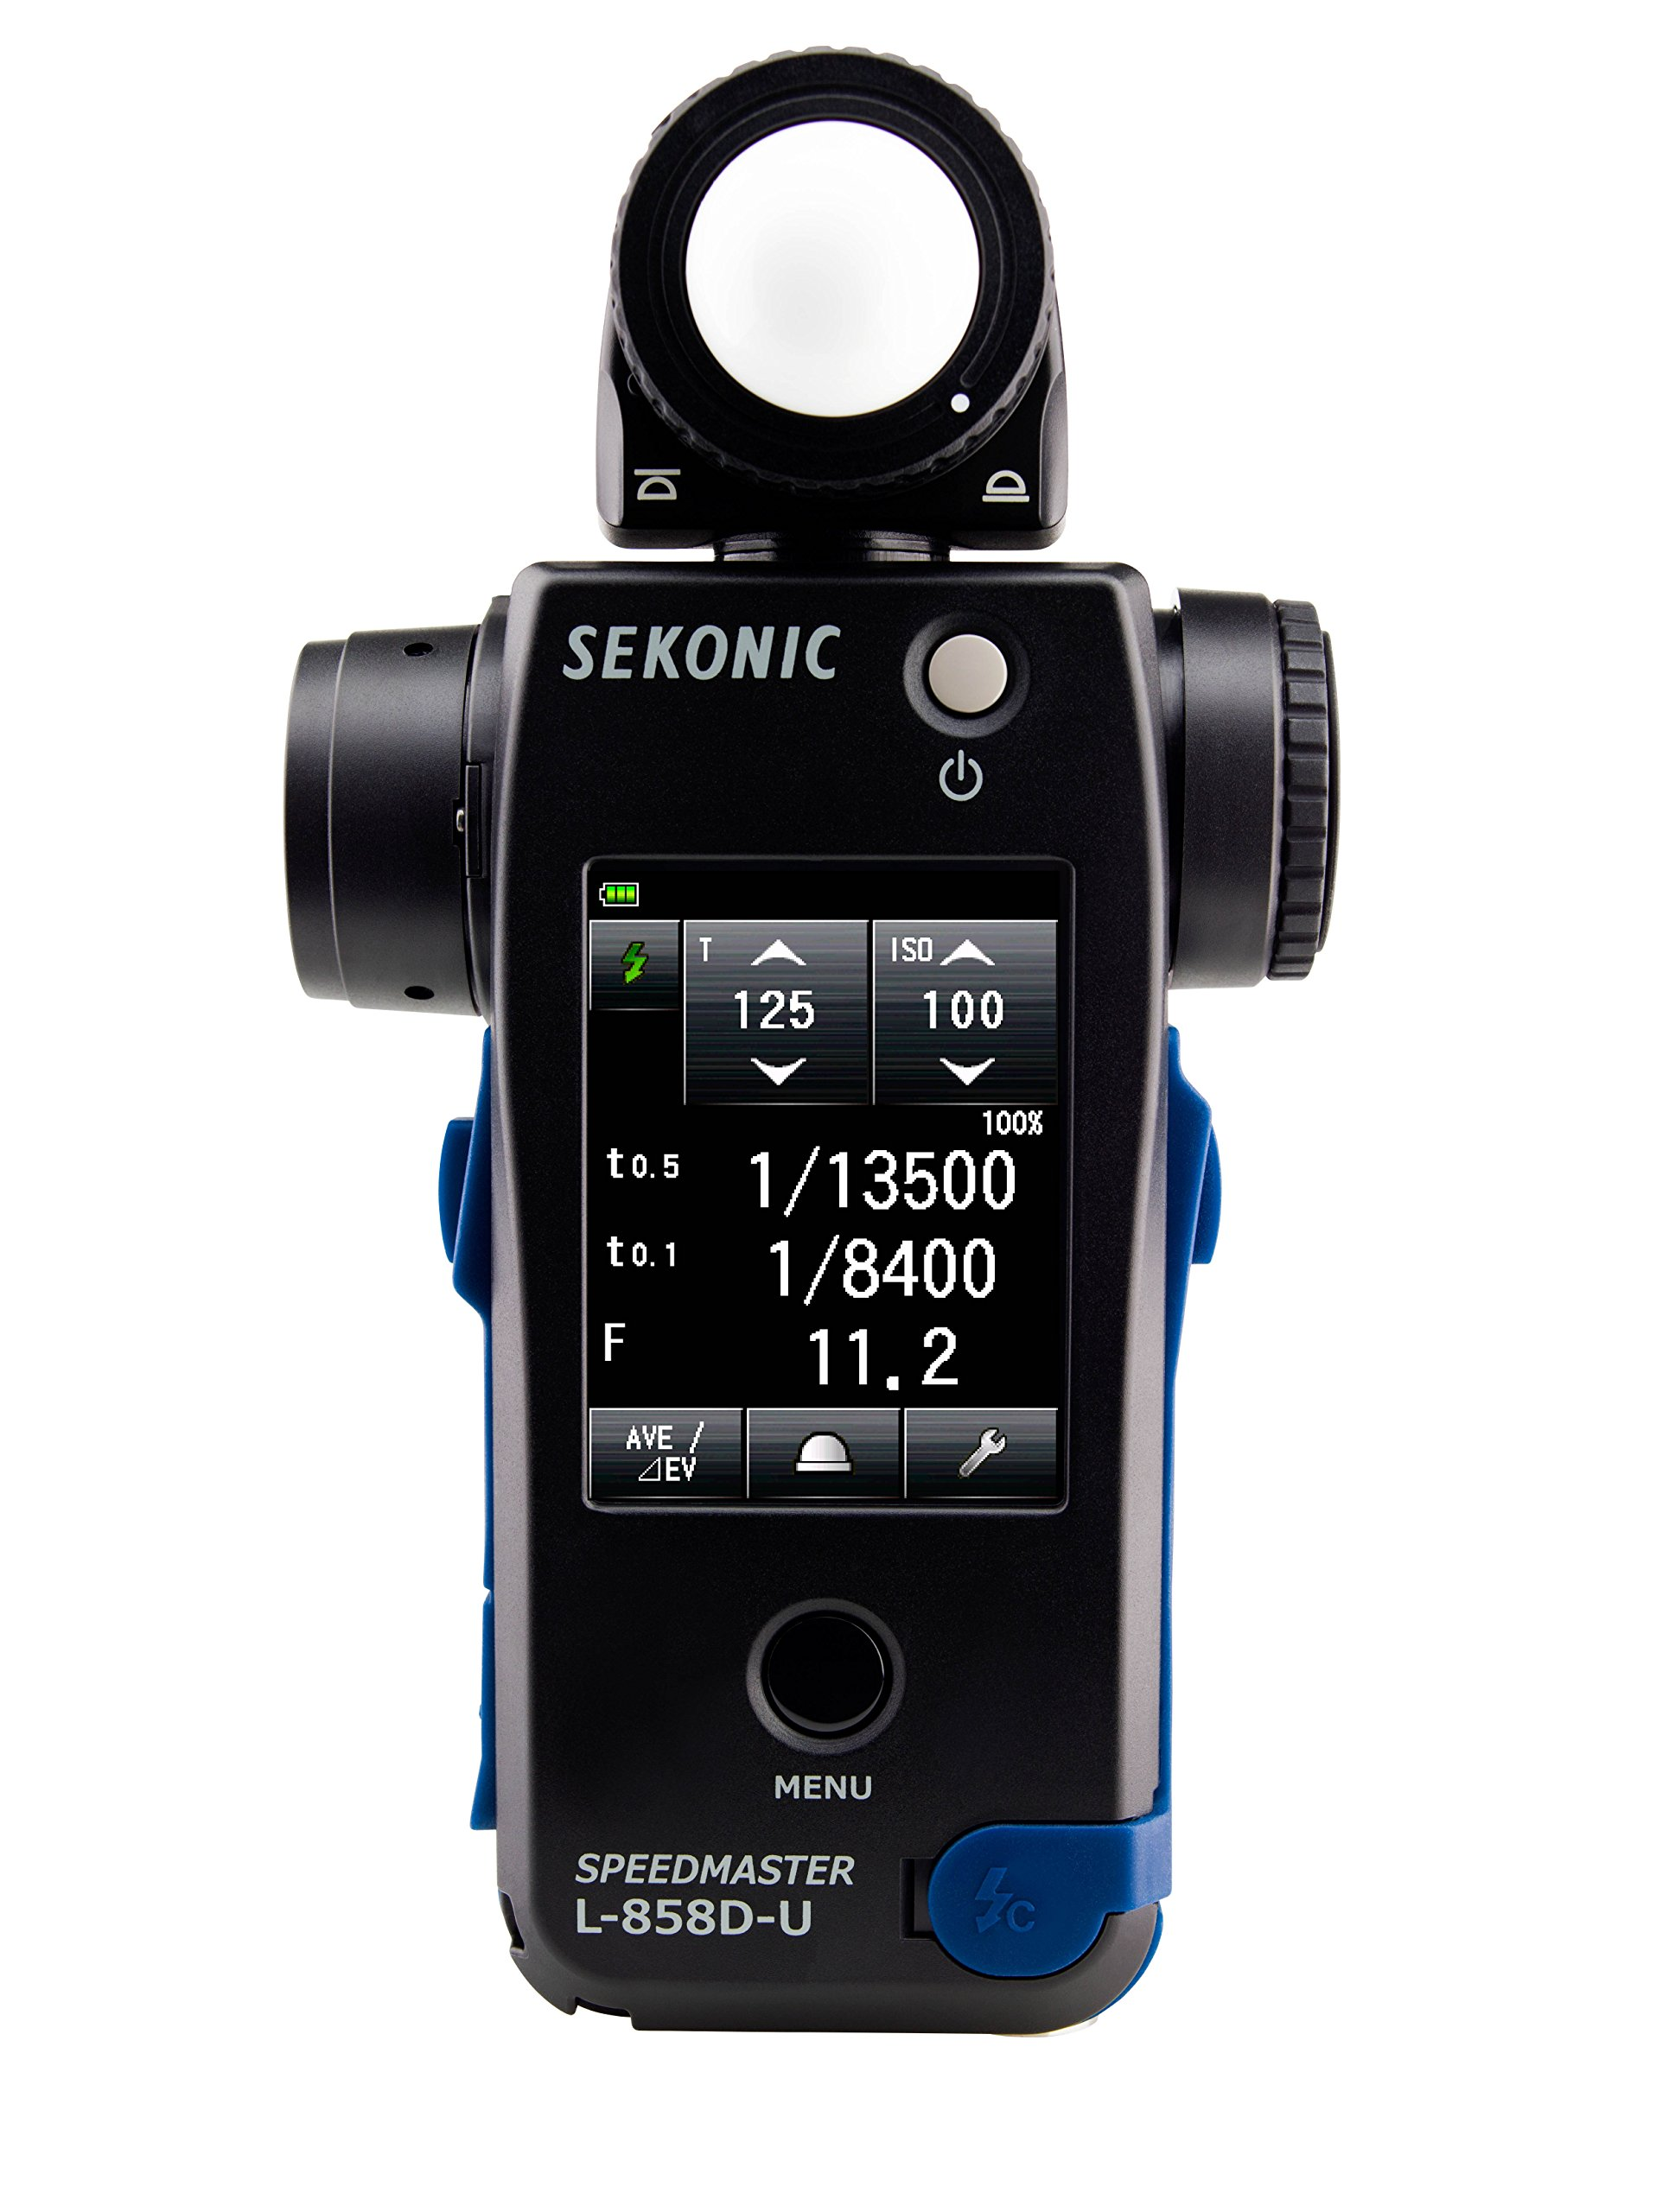 Sekonic Speedmaster L-858D-U Light Meter (401-858) by Sekonic